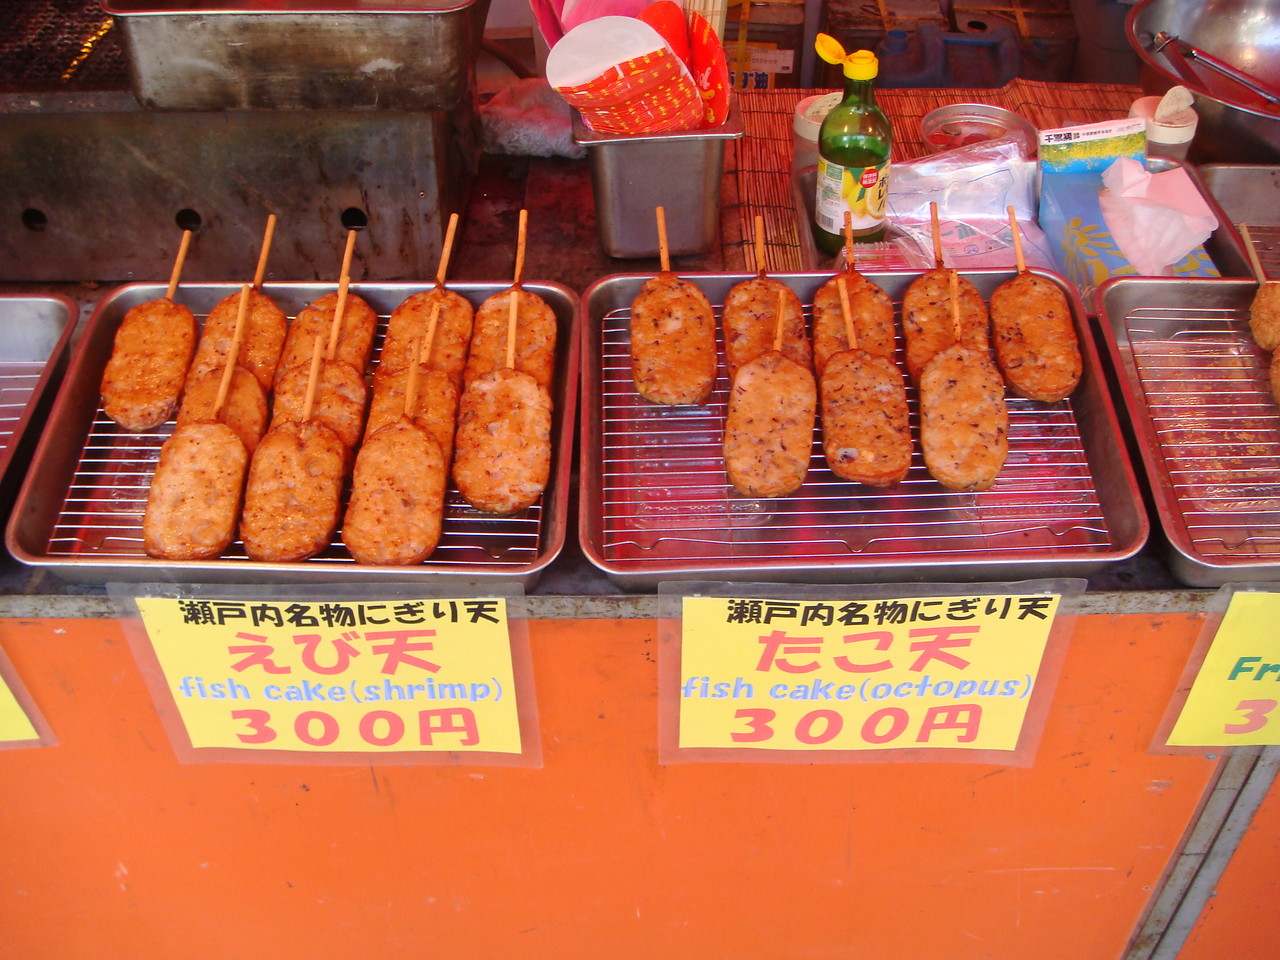 Seafood pops for sale at Miyajima, Japan